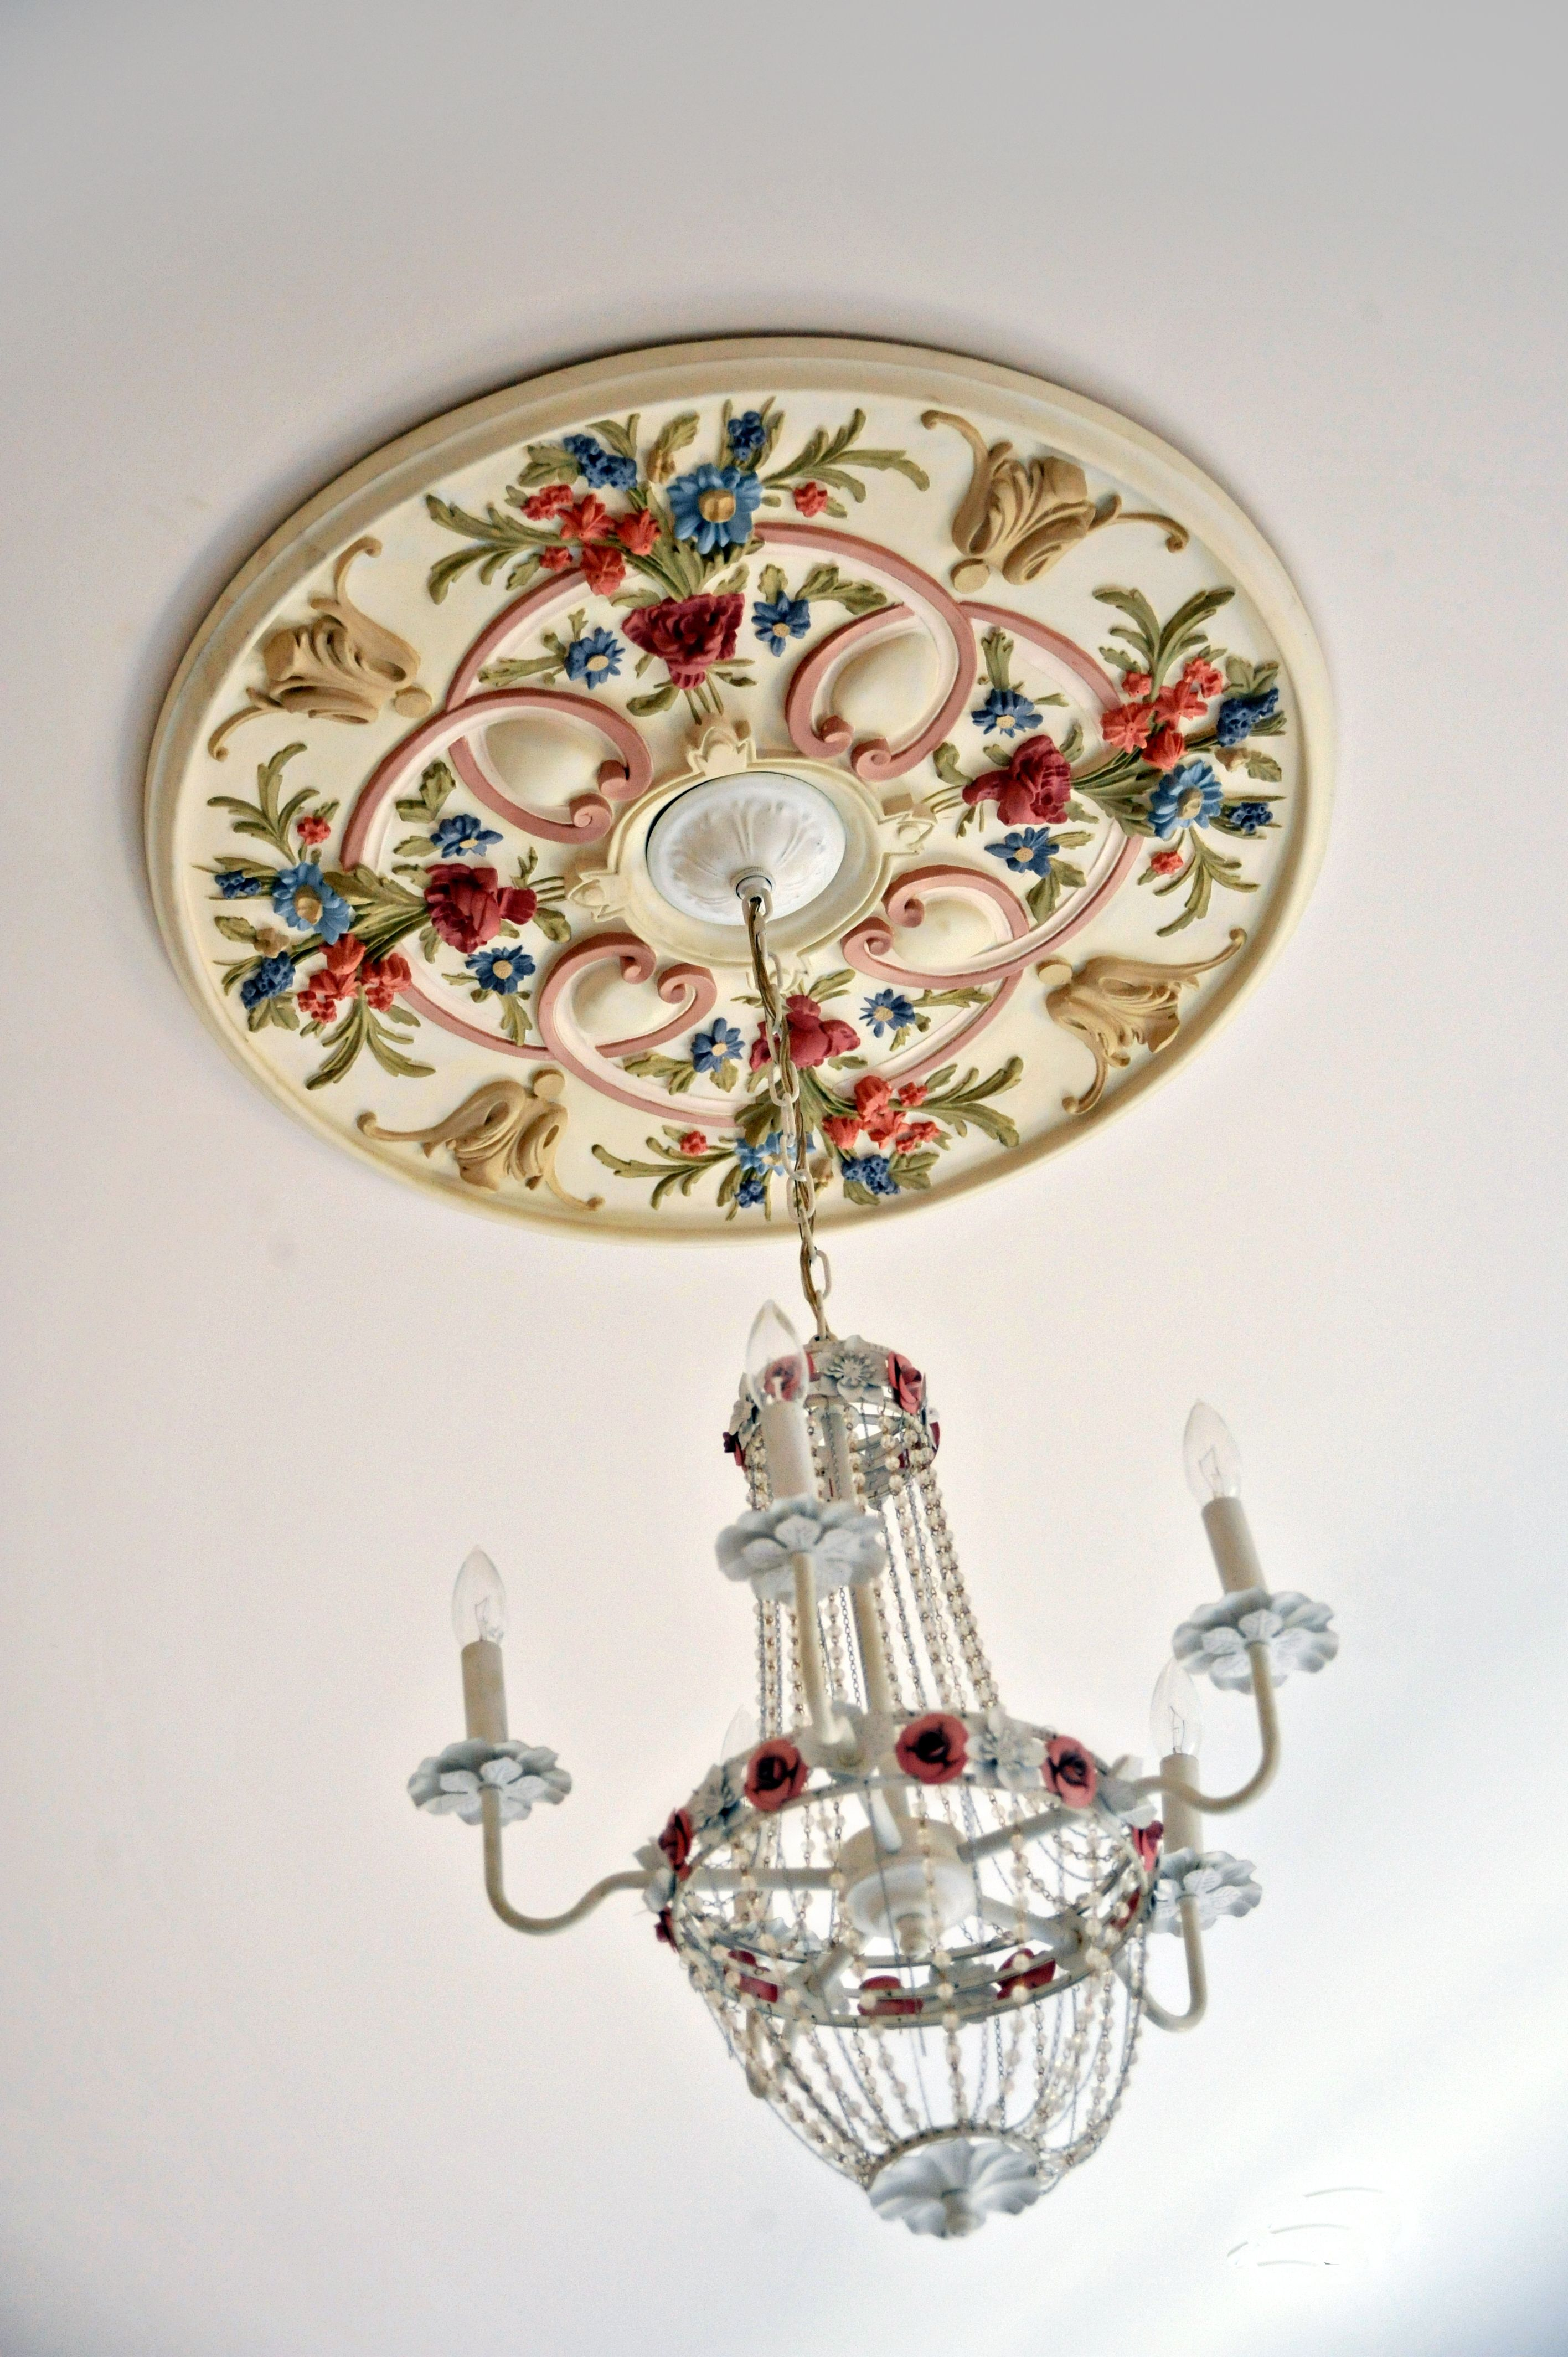 Handpainted Beautiful Detail Painted Ceiling Ceiling Medallions Painted Chandelier